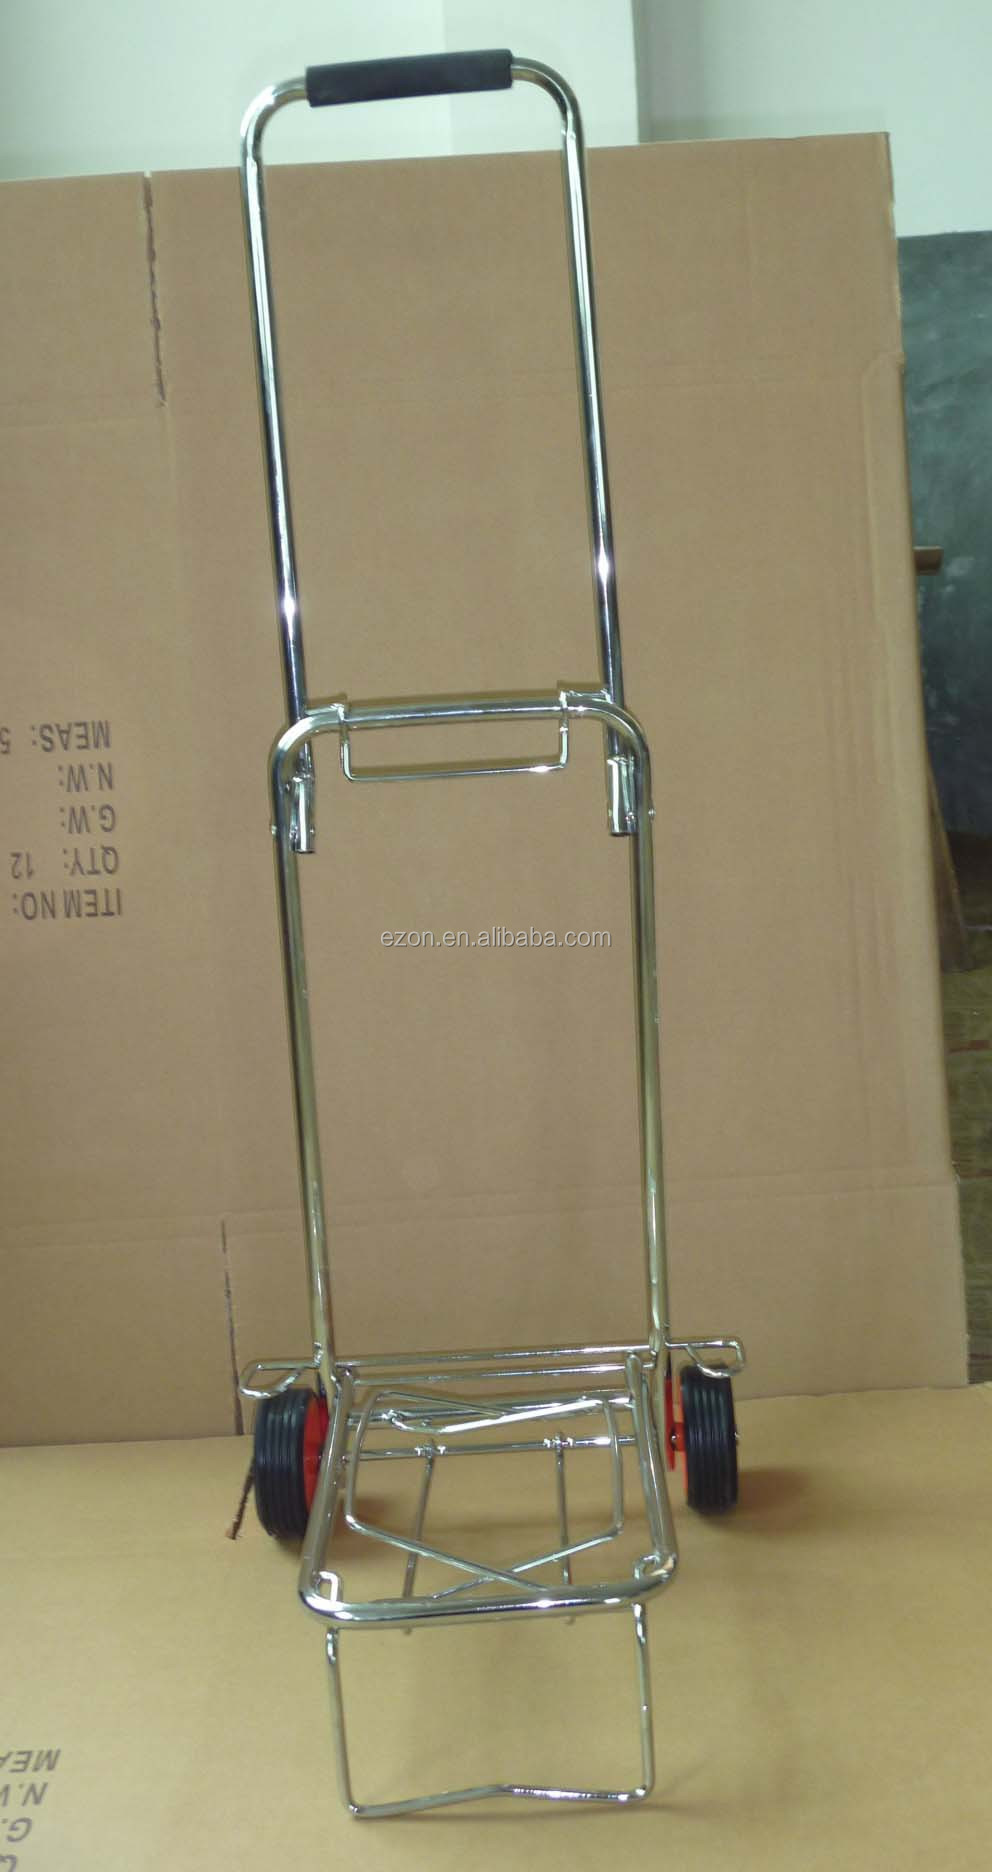 Travel Small Luggage Cart,Portable Folding Small Shopping Cart ...